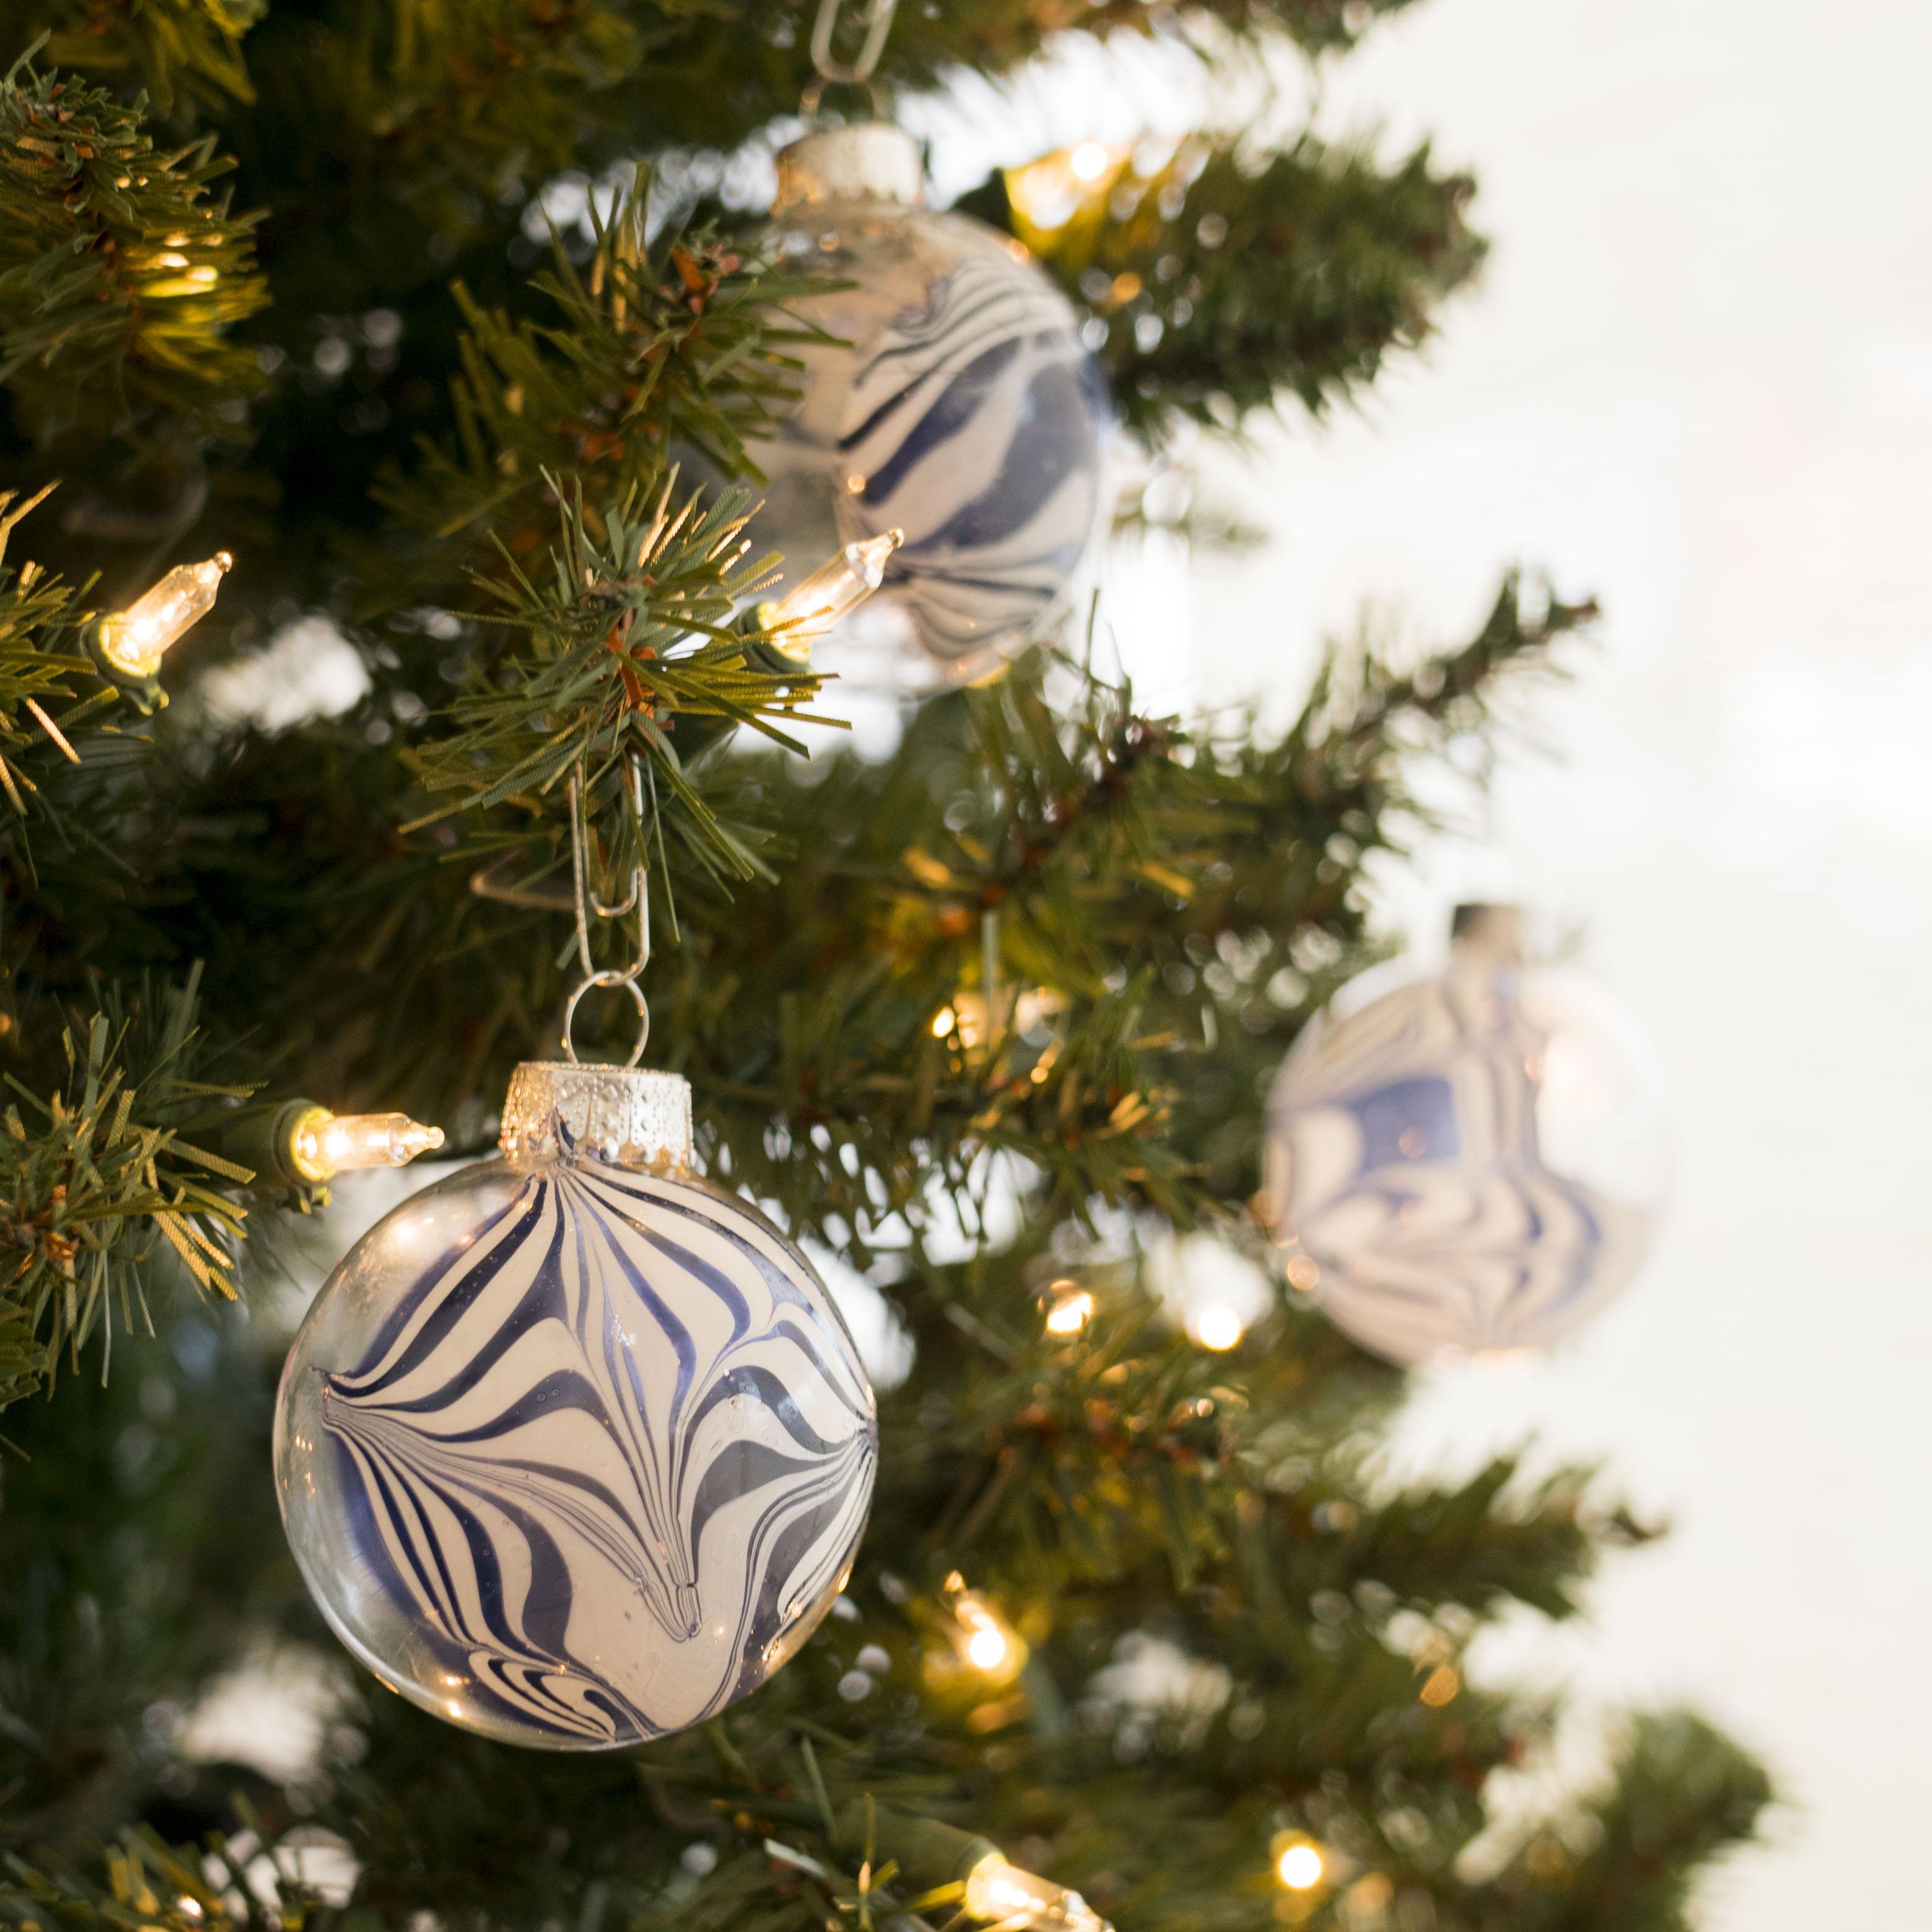 10 Homemade Christmas Ornaments for Kids